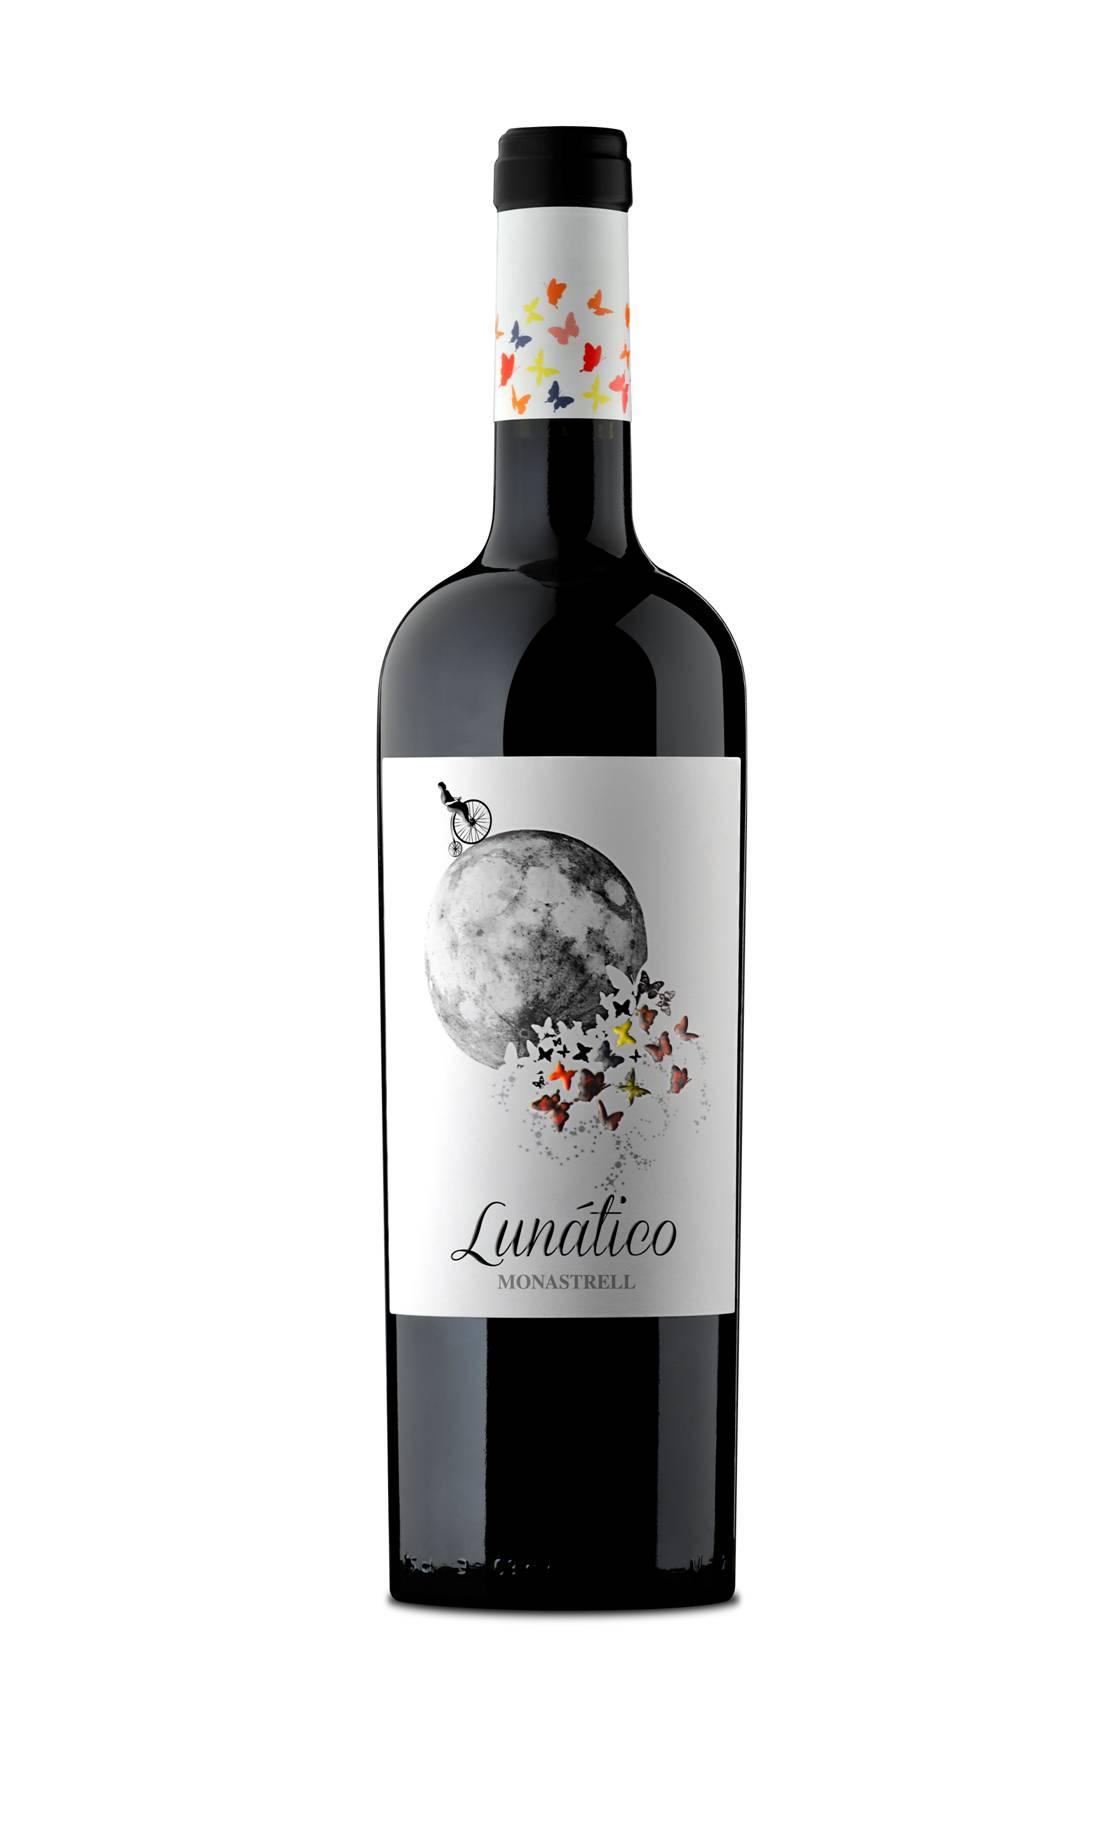 Bodegas casa de la ermita presenta su nuevo vino lun tico - Bodegas en casa ...